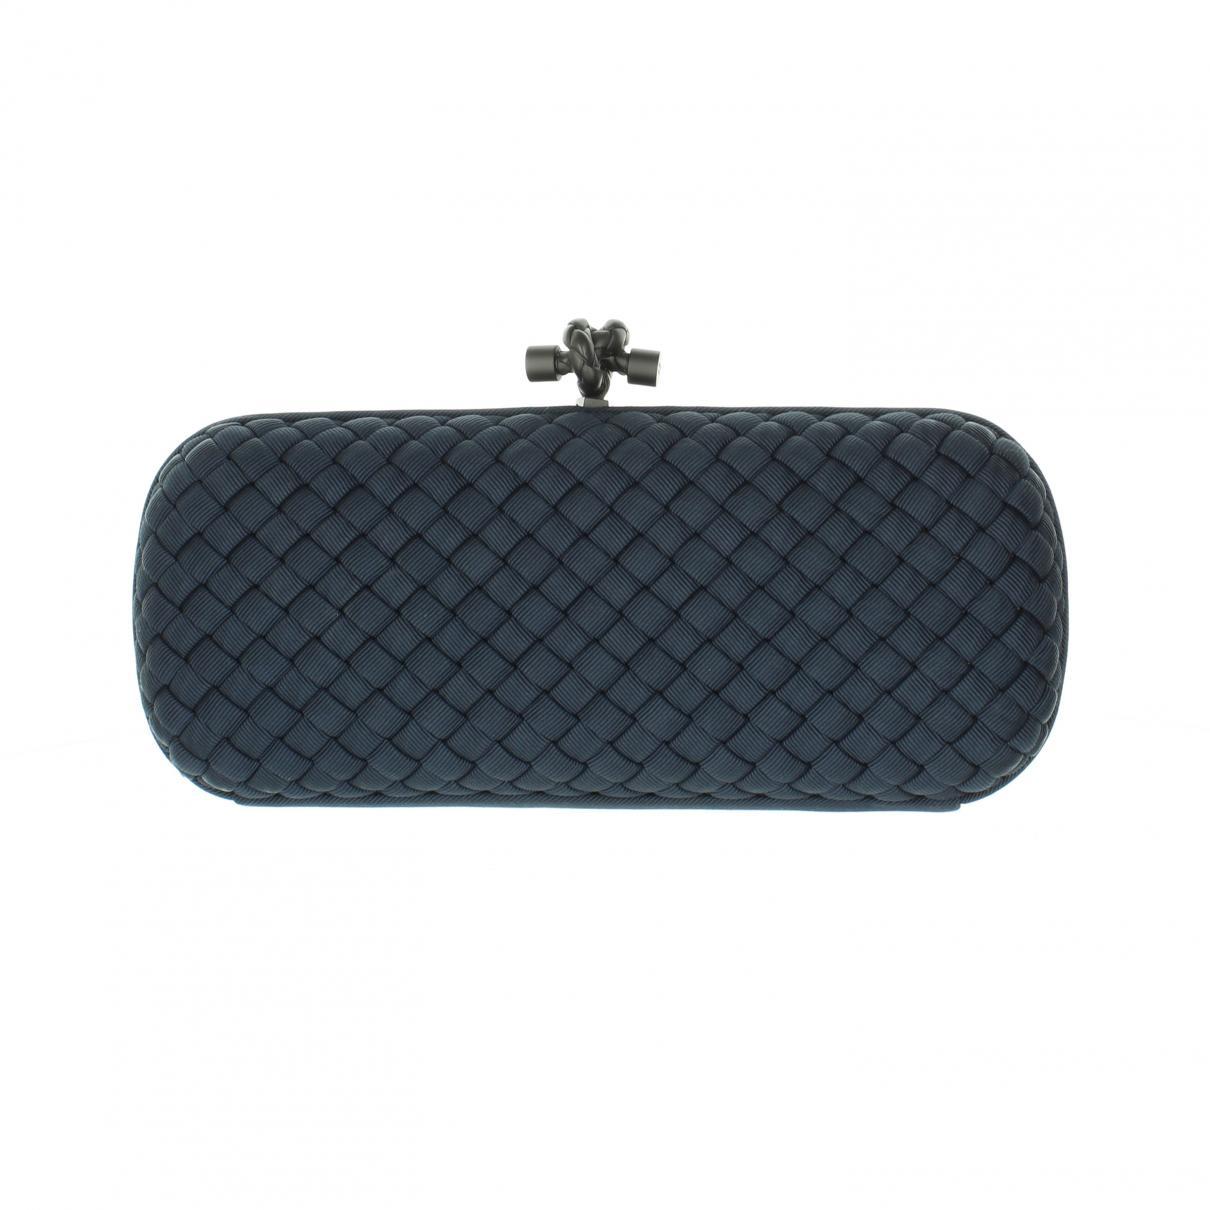 9fd07289485c Bottega Veneta - Blue Cloth Clutch Bag - Lyst. View fullscreen